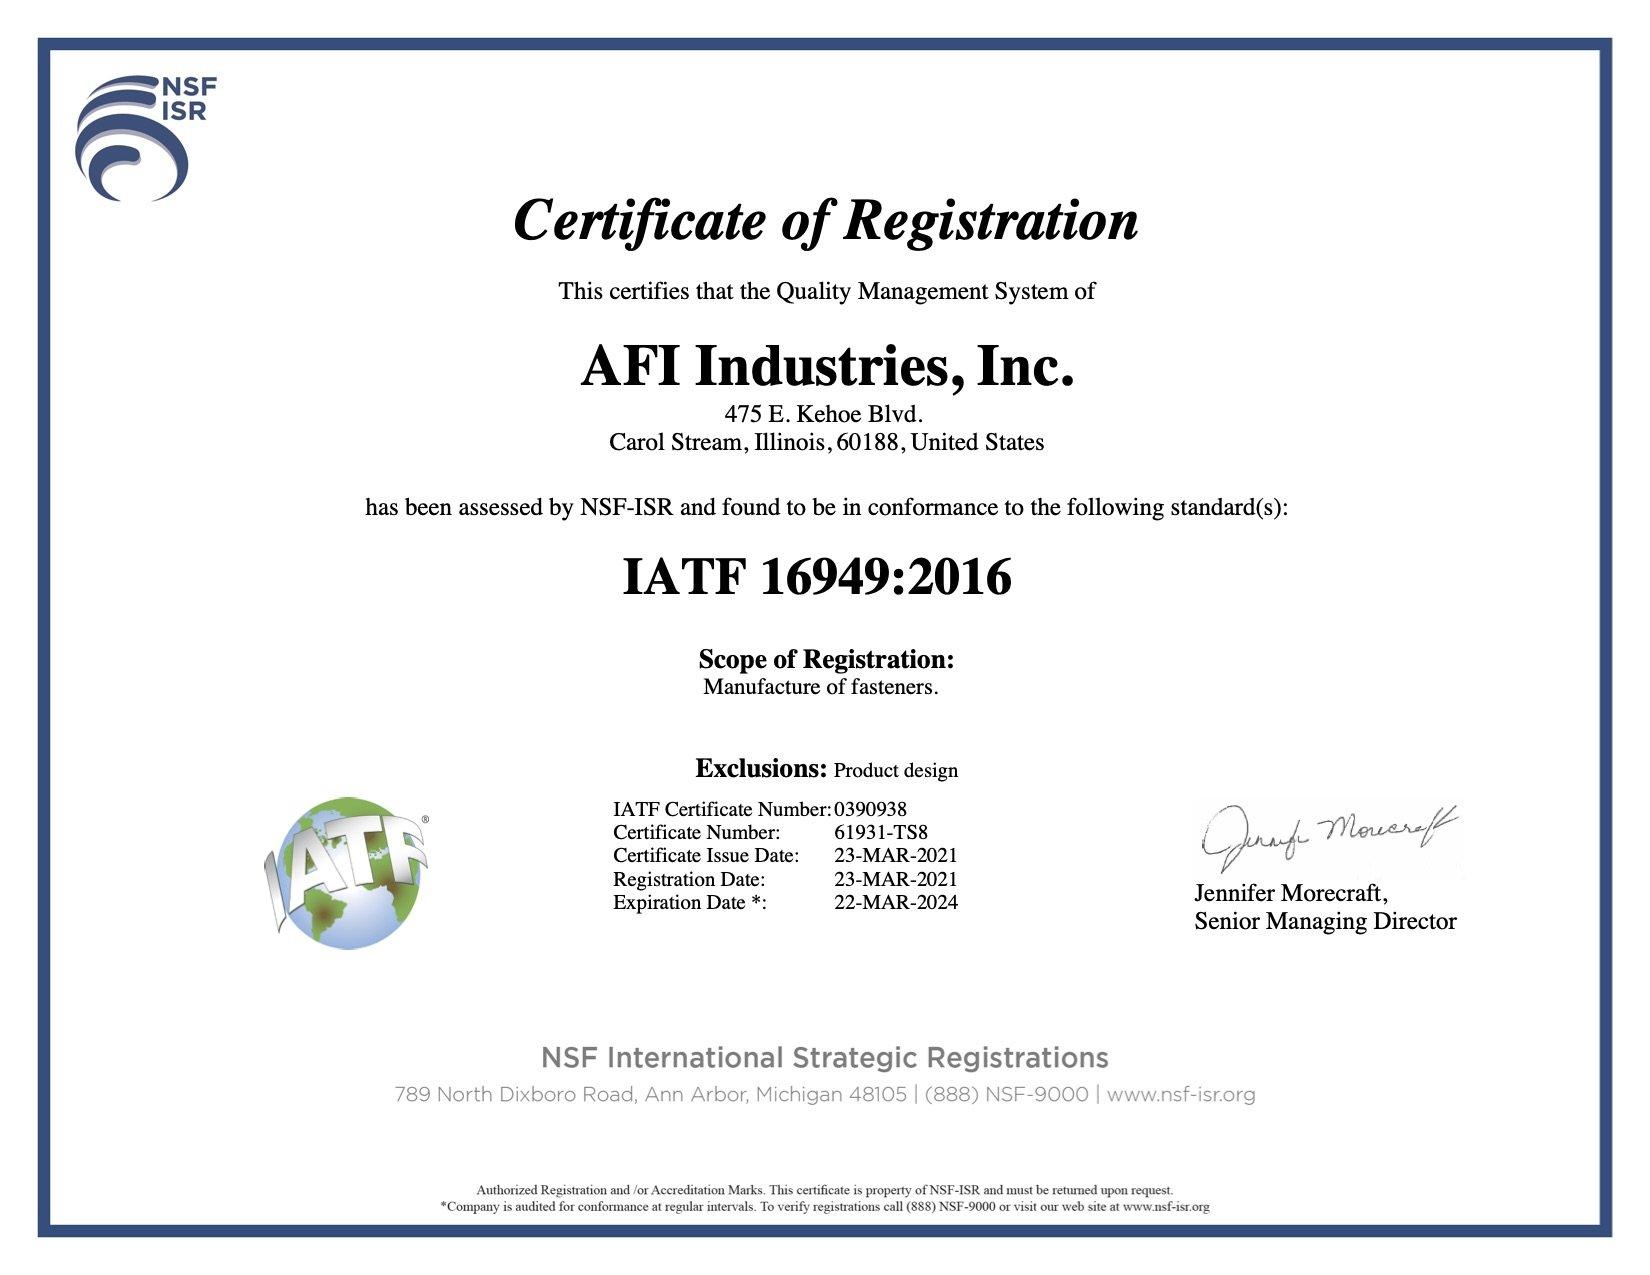 IATF 16949 2016 certificate for AFI Industries